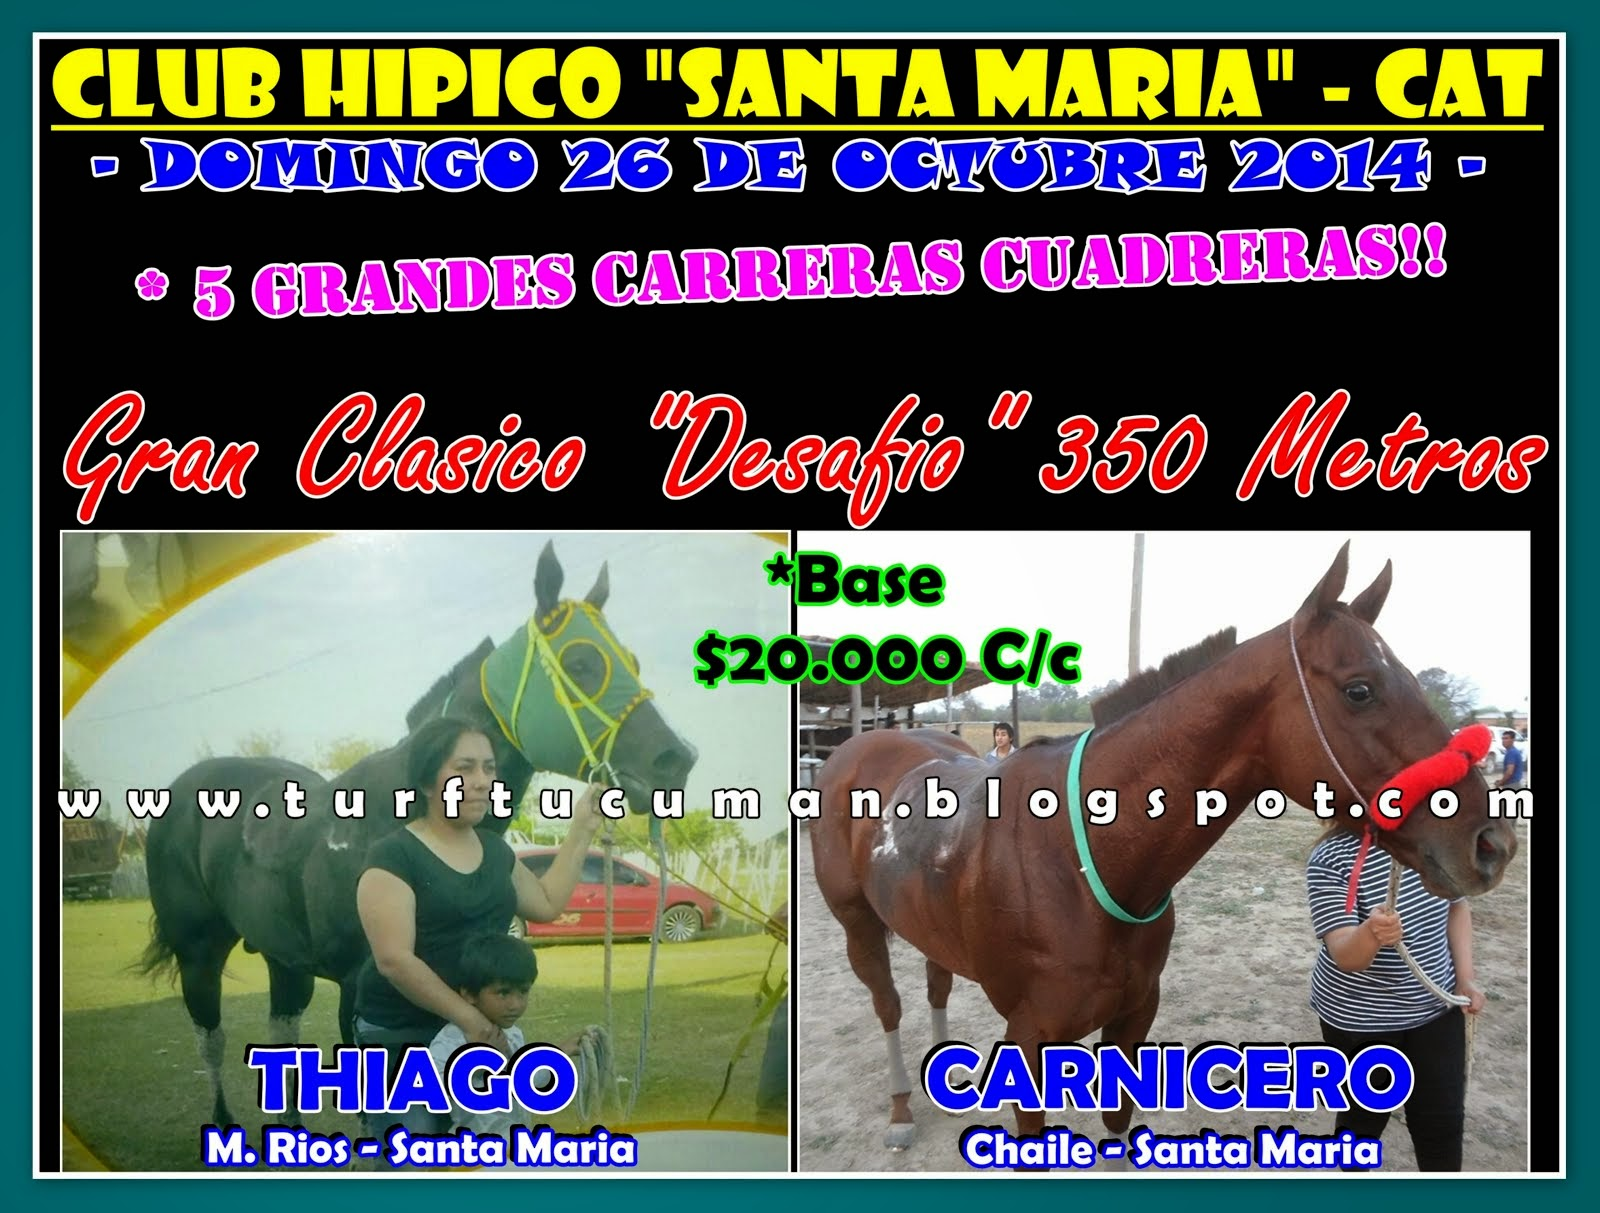 THIAGO VS CARNICERO